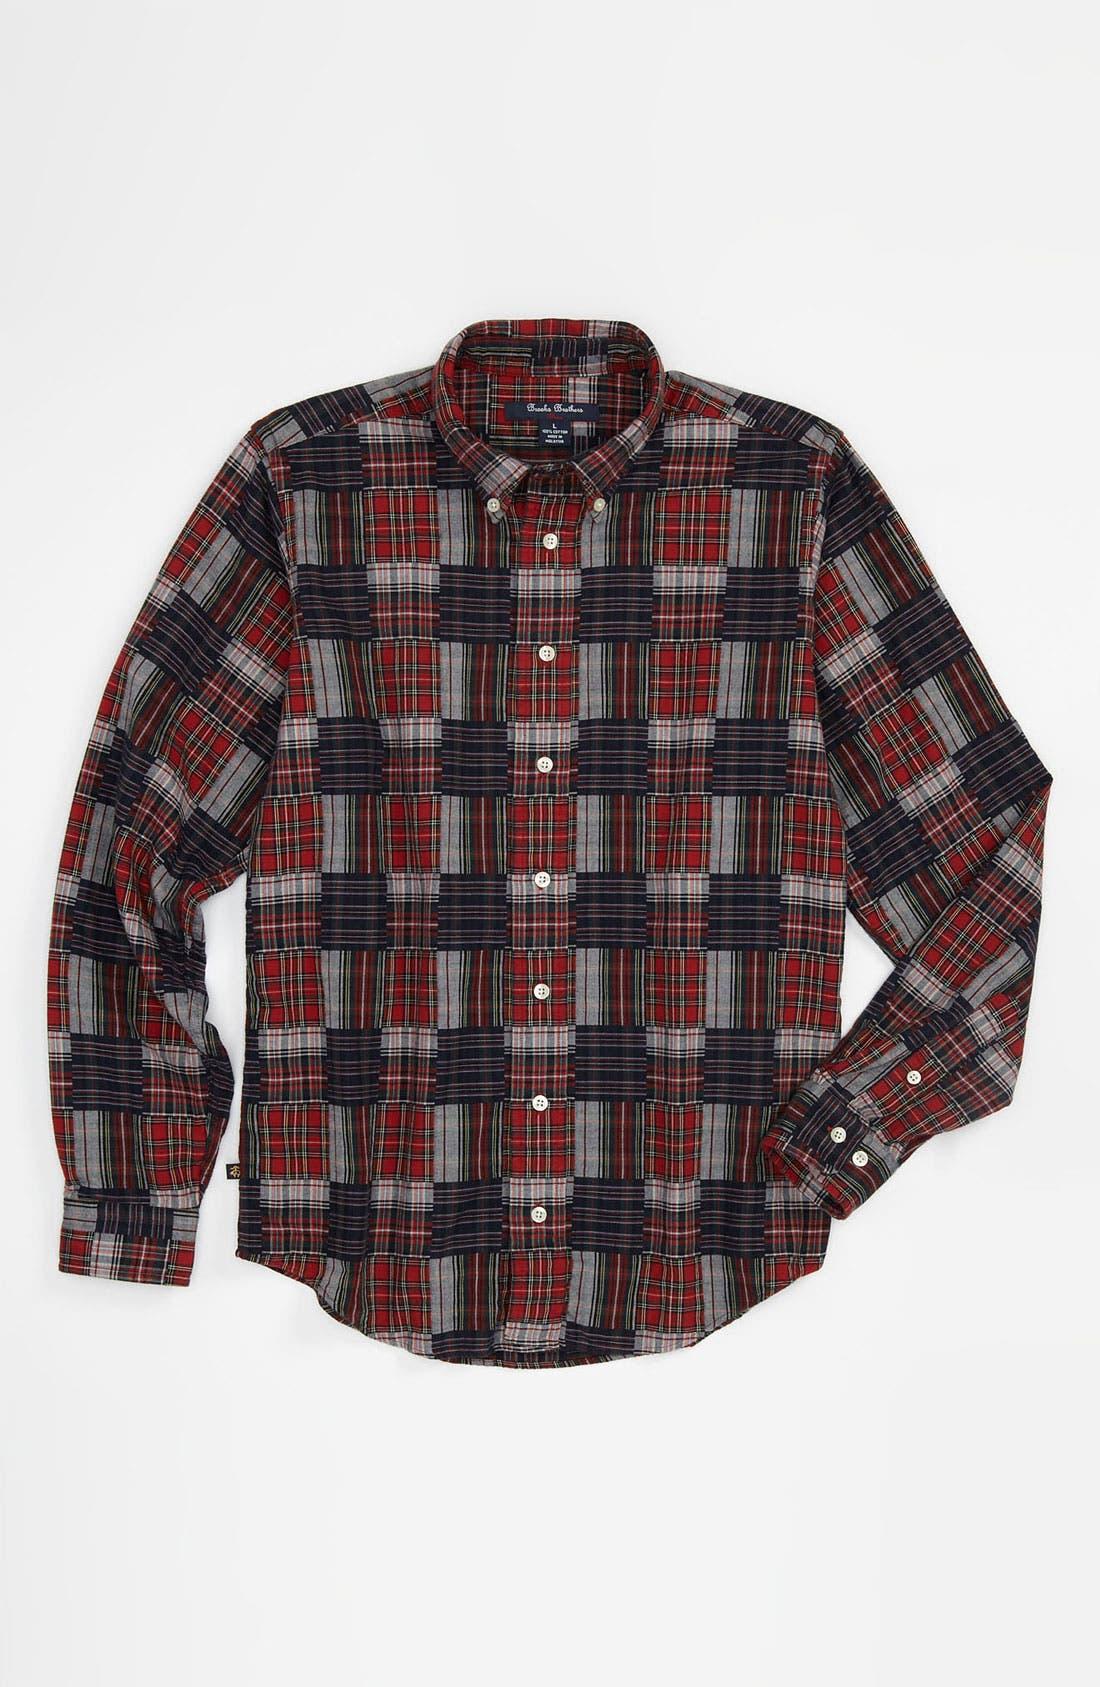 Alternate Image 1 Selected - Brooks Brothers Tartan Patchwork Sport Shirt (Big Boys)